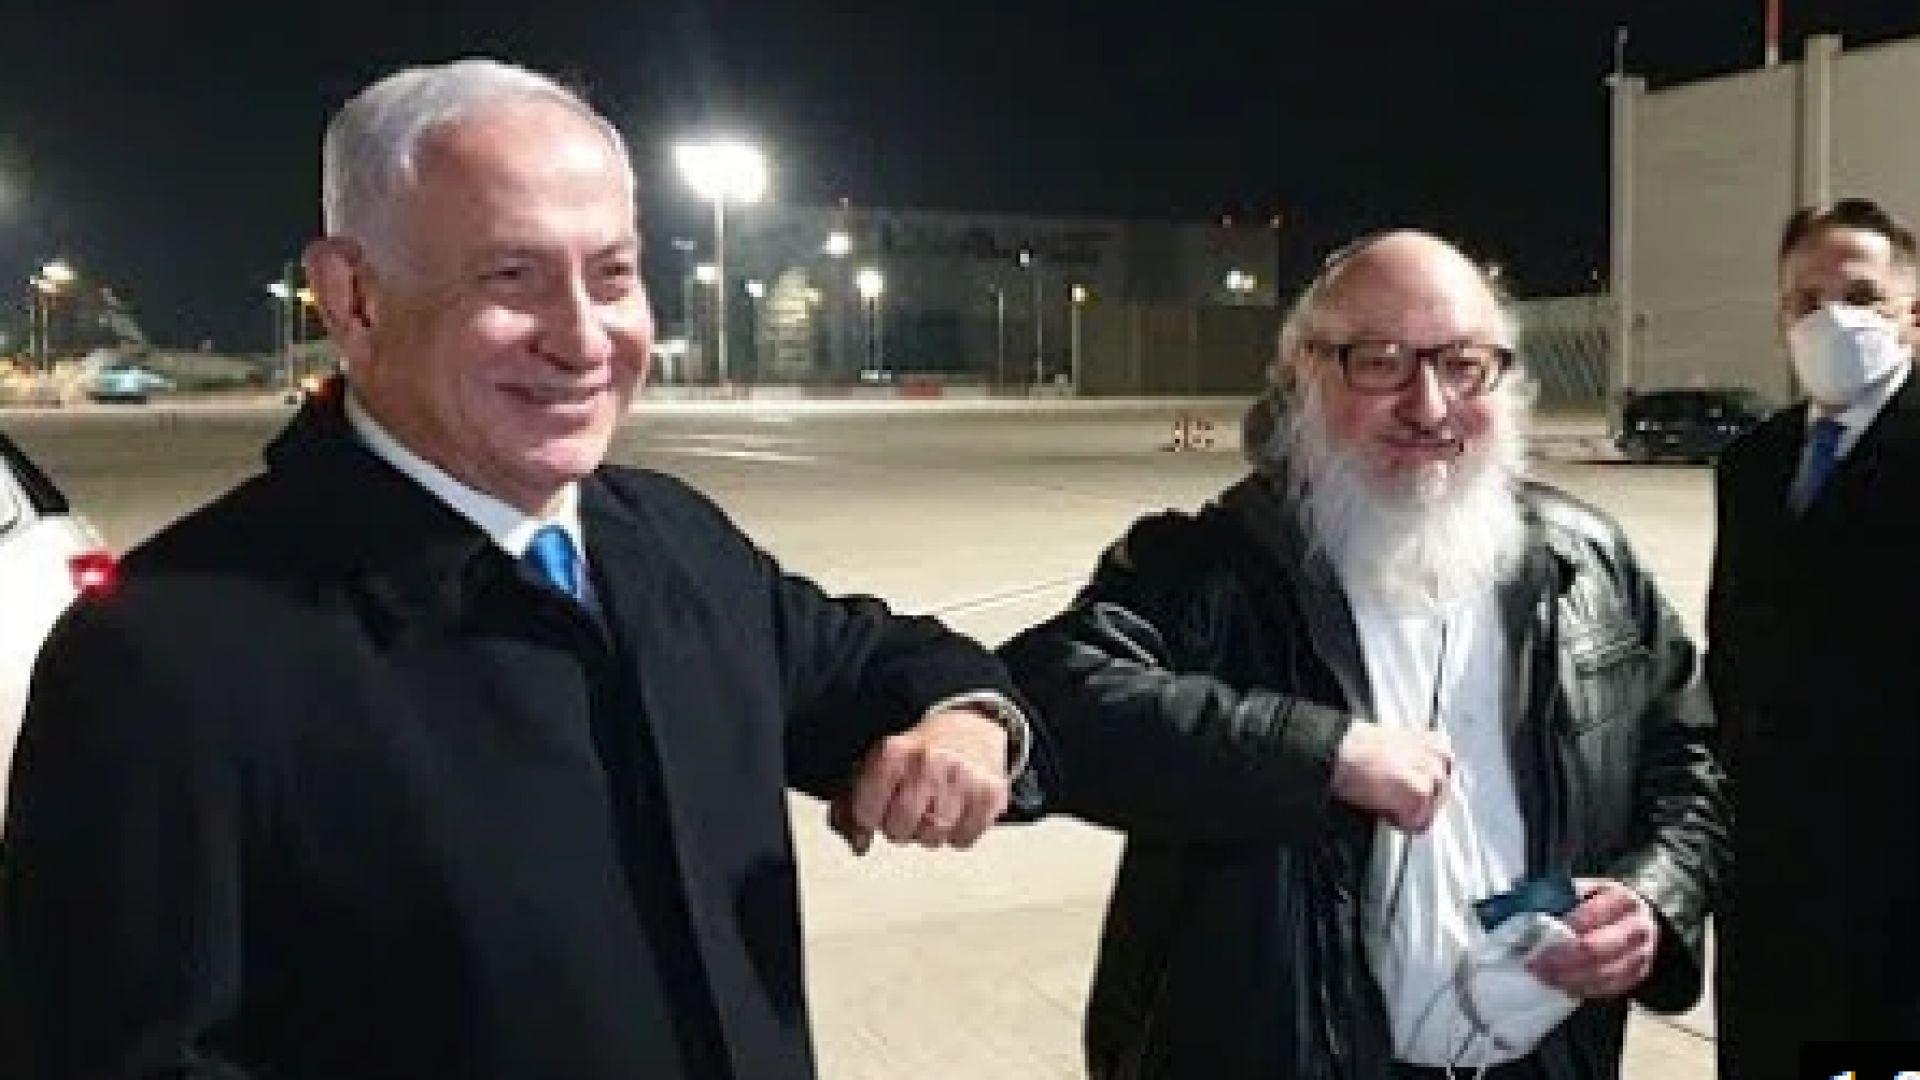 Нетаняху посрещна Джонатан Полард, който прекара 30 г. в US затвор заради шпионаж за Израел